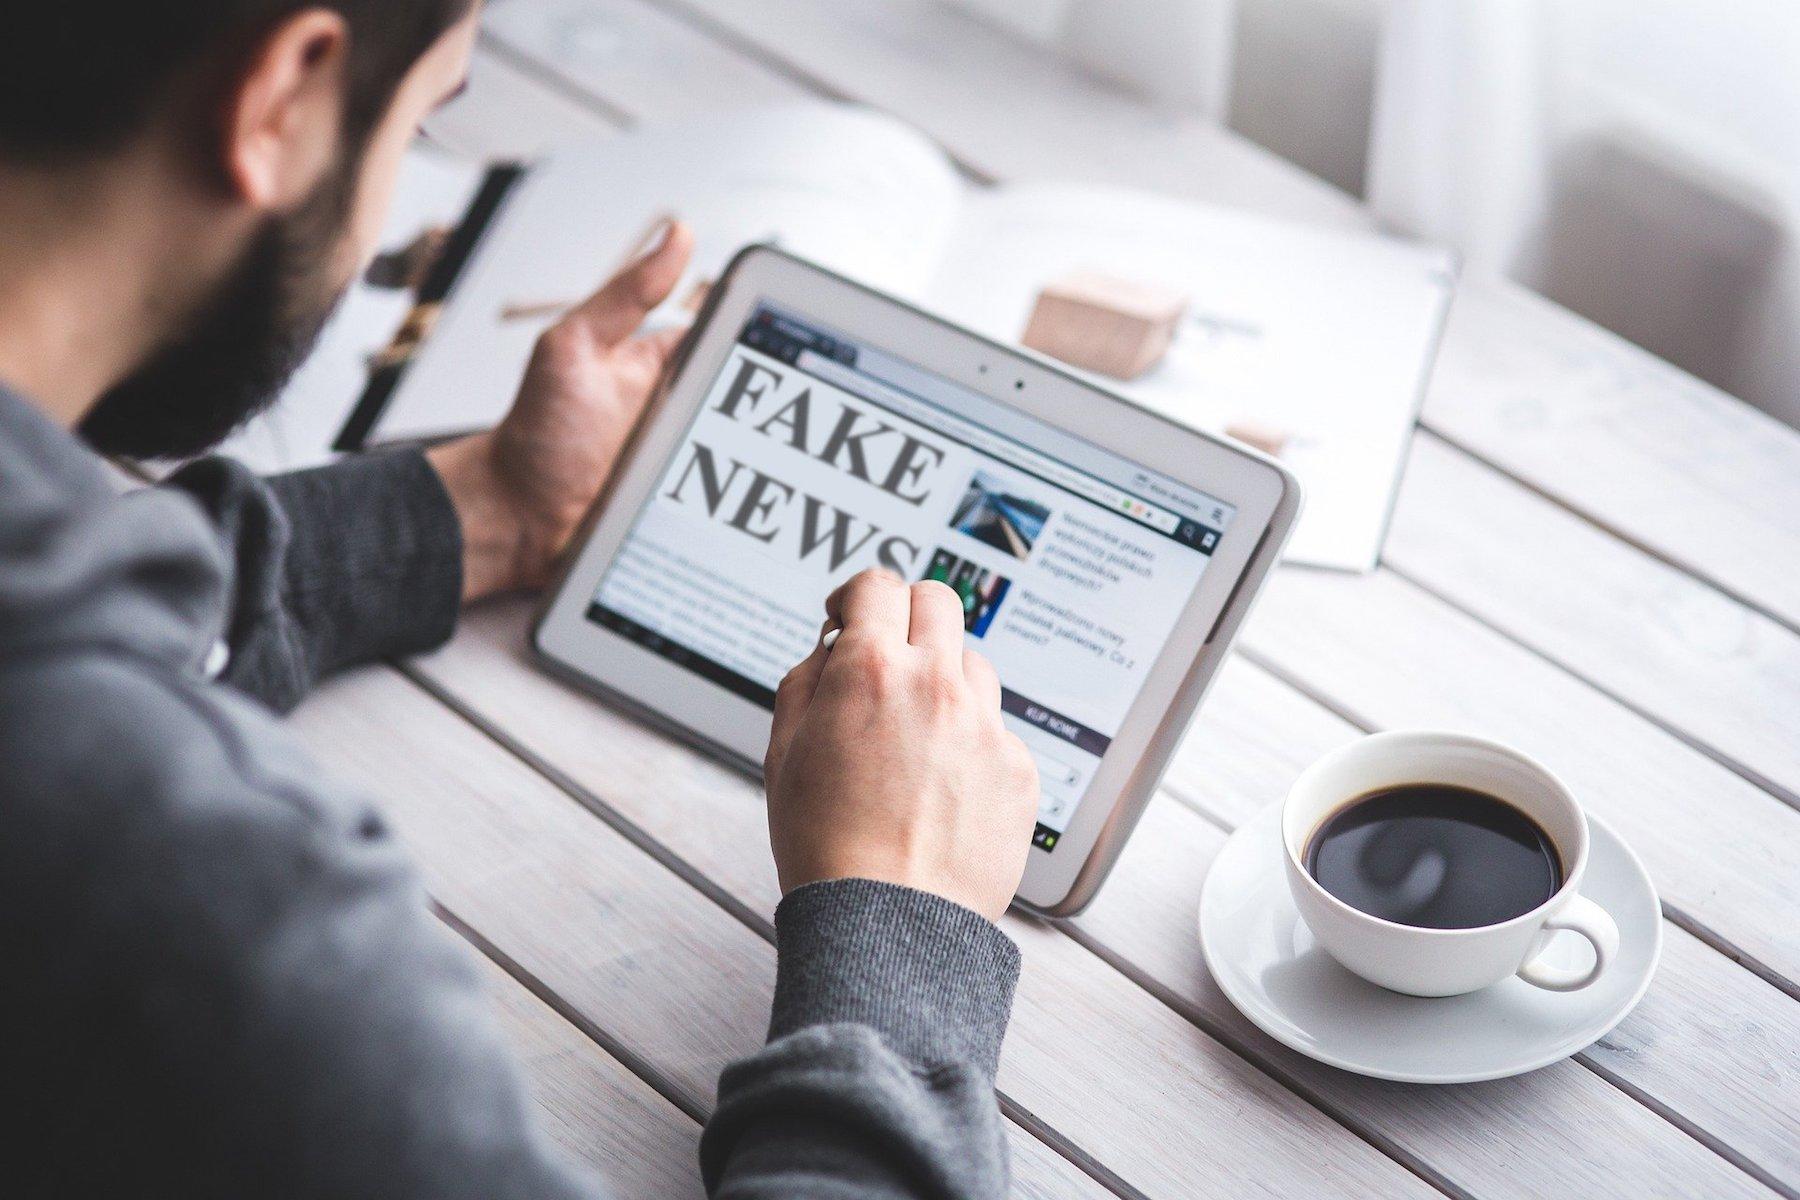 fake-news-4881486 1920